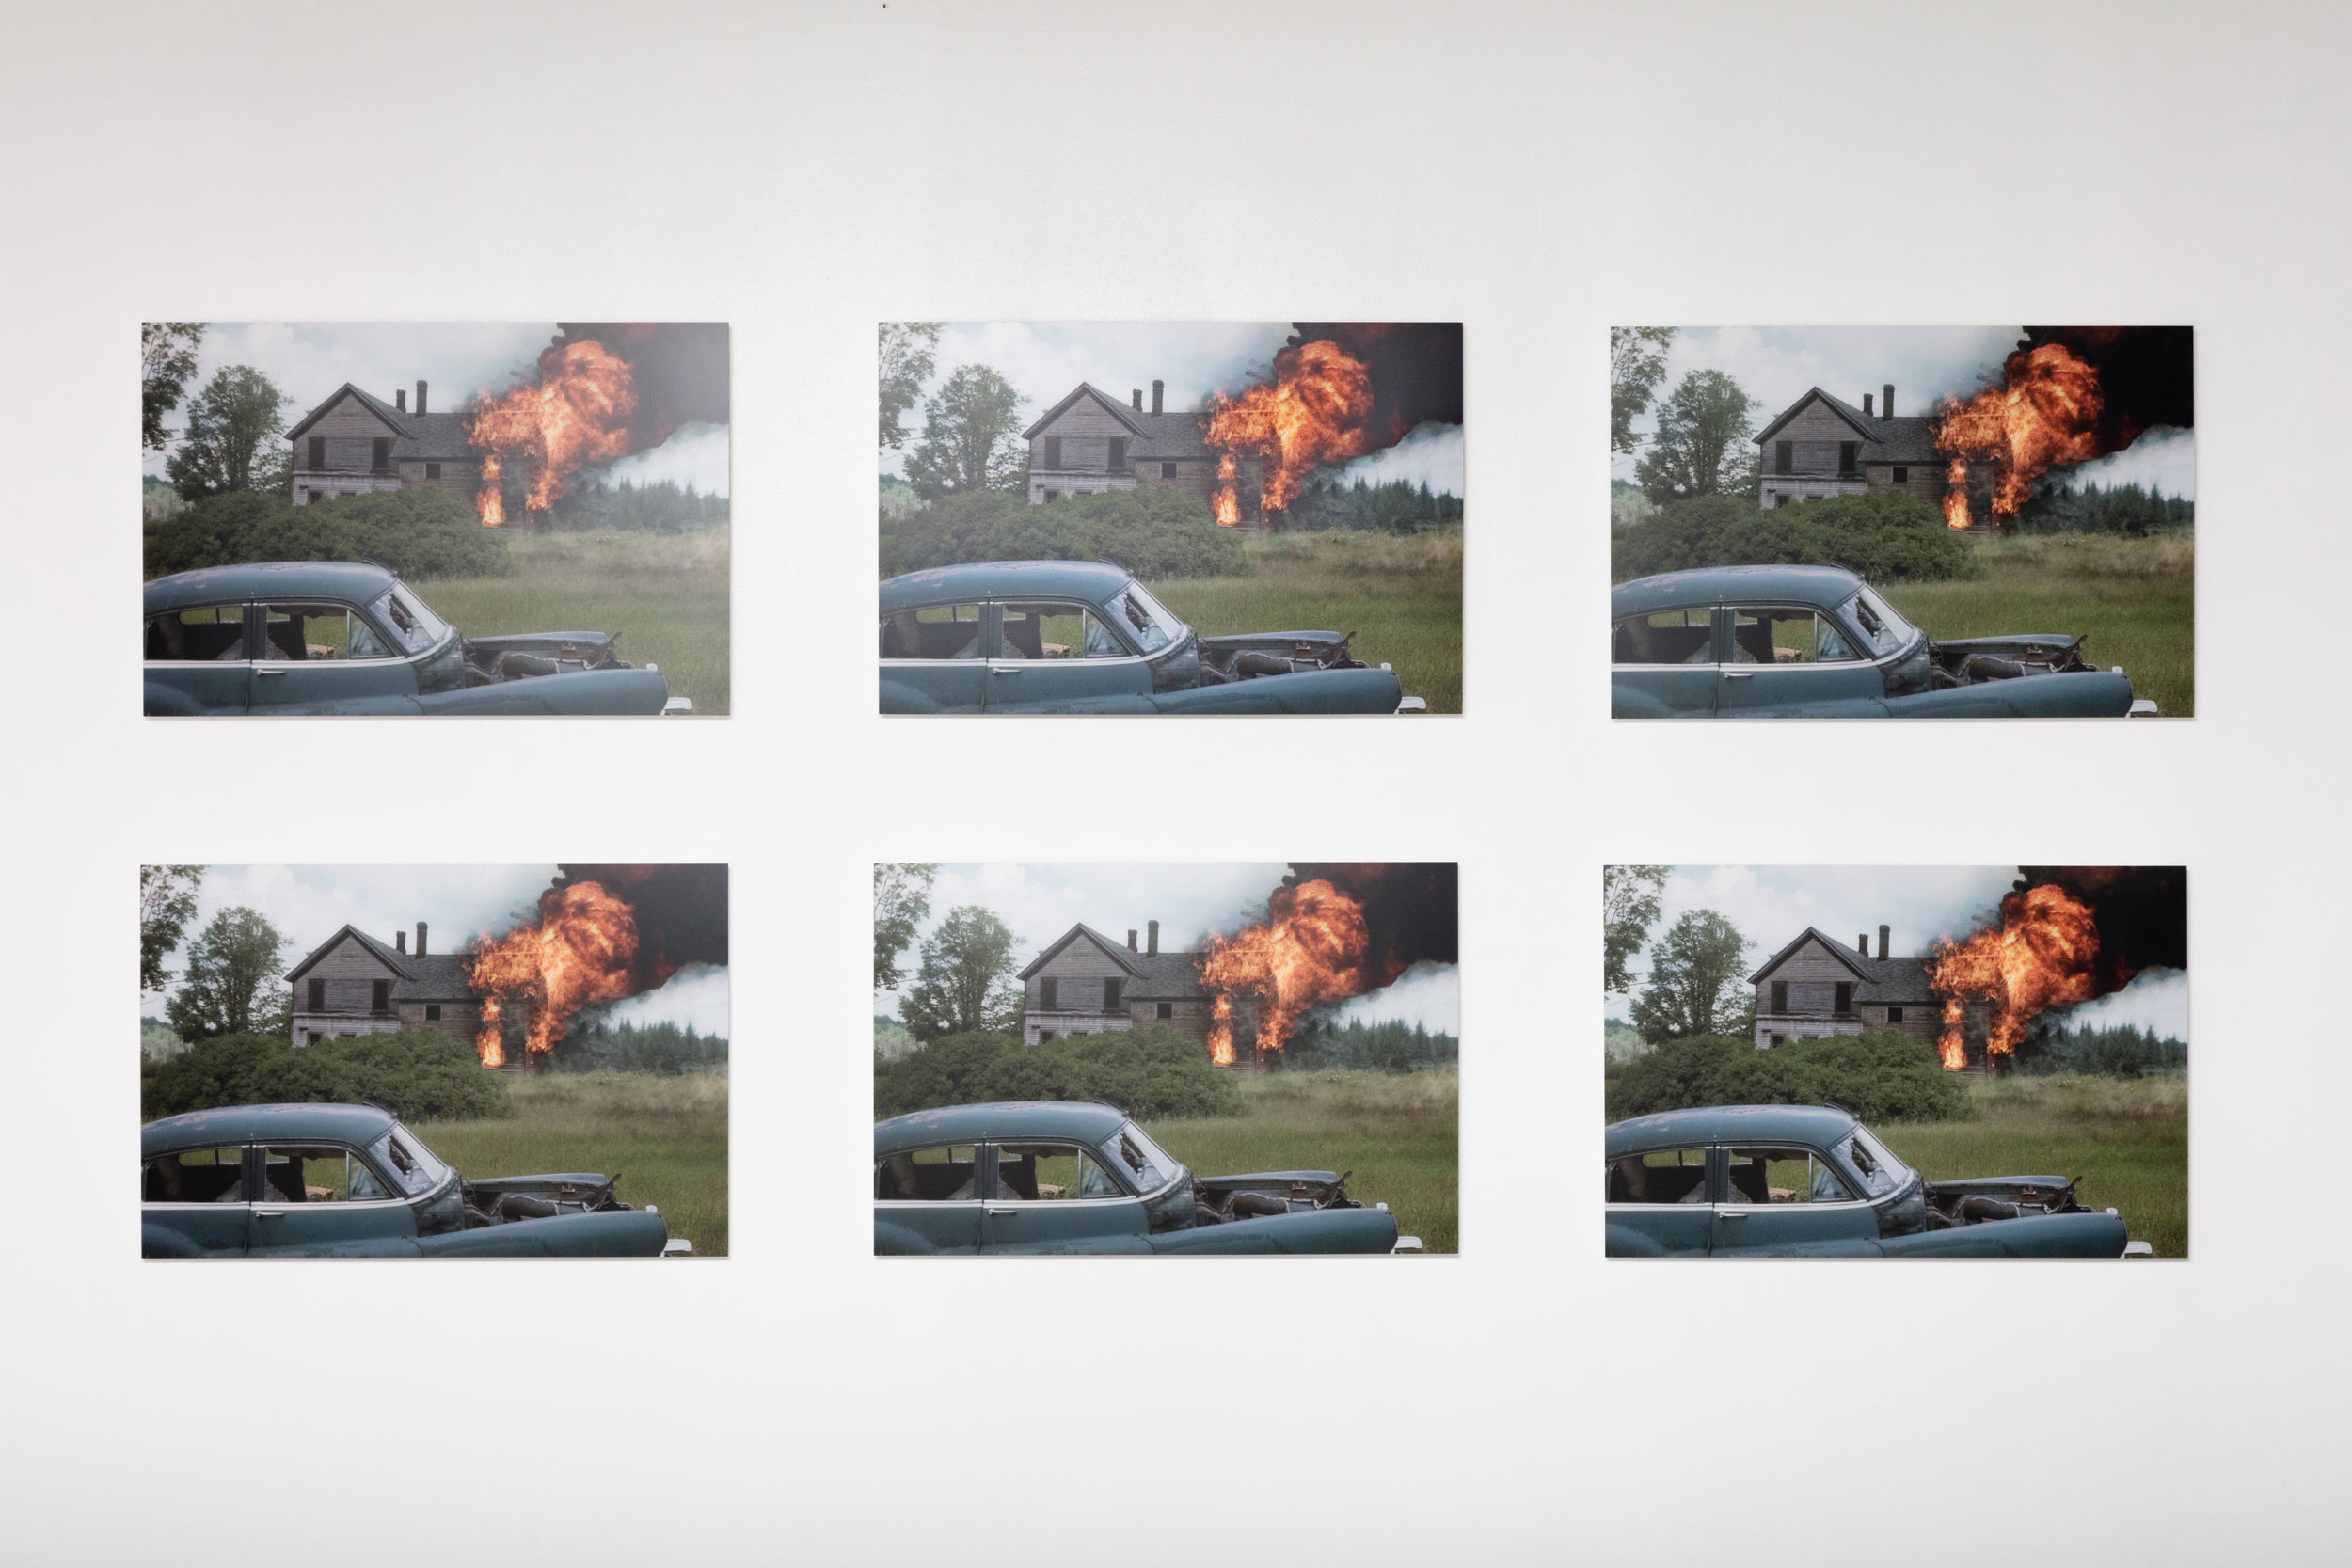 Sam Fayed's absurdist deep-fakes turn estate photography into art